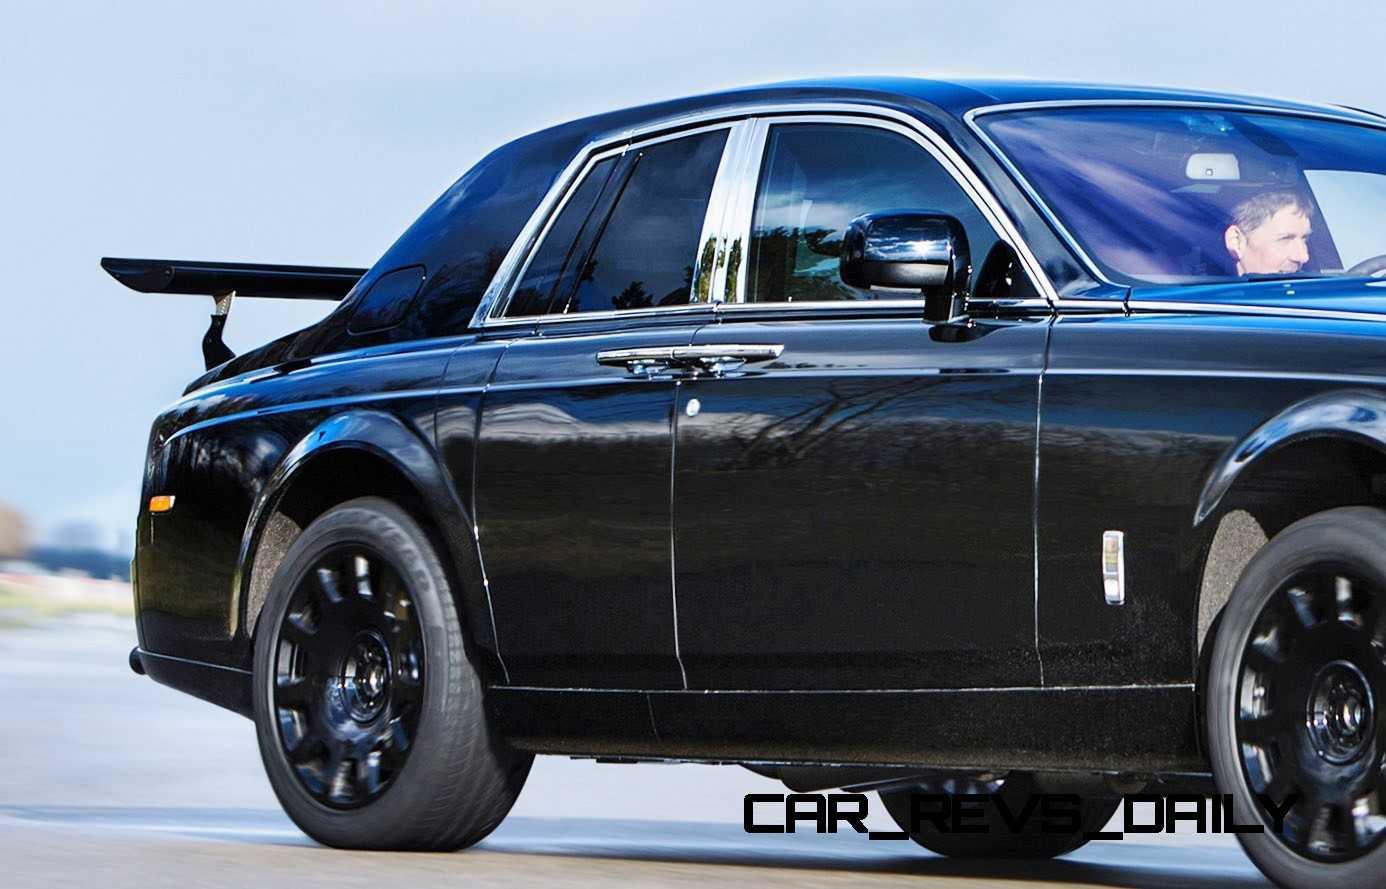 2017 Rolls Royce Suv Project Cullinan